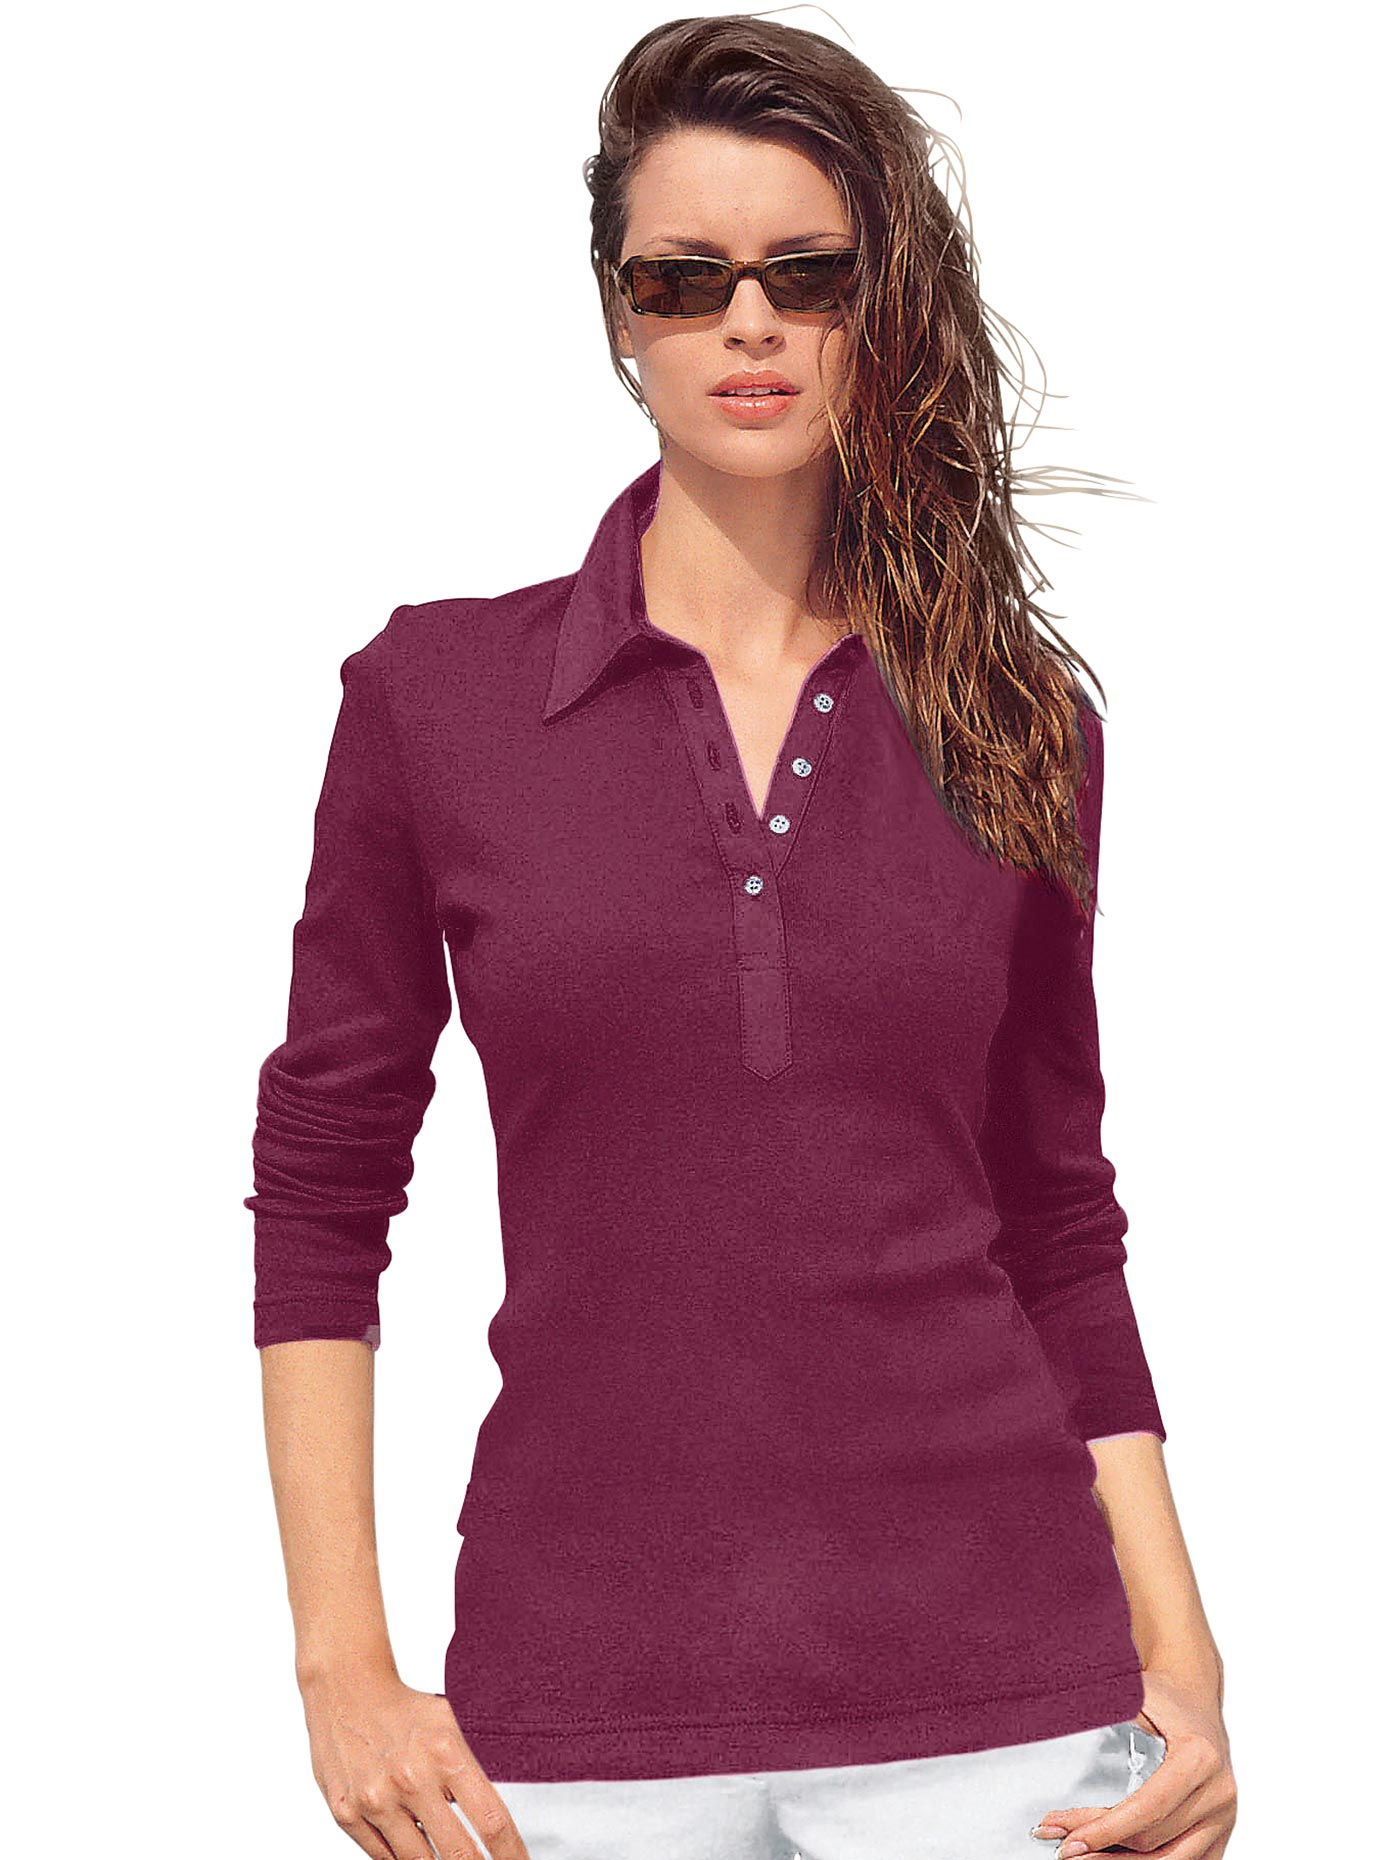 casual looks -  Poloshirt aus Baumwolle